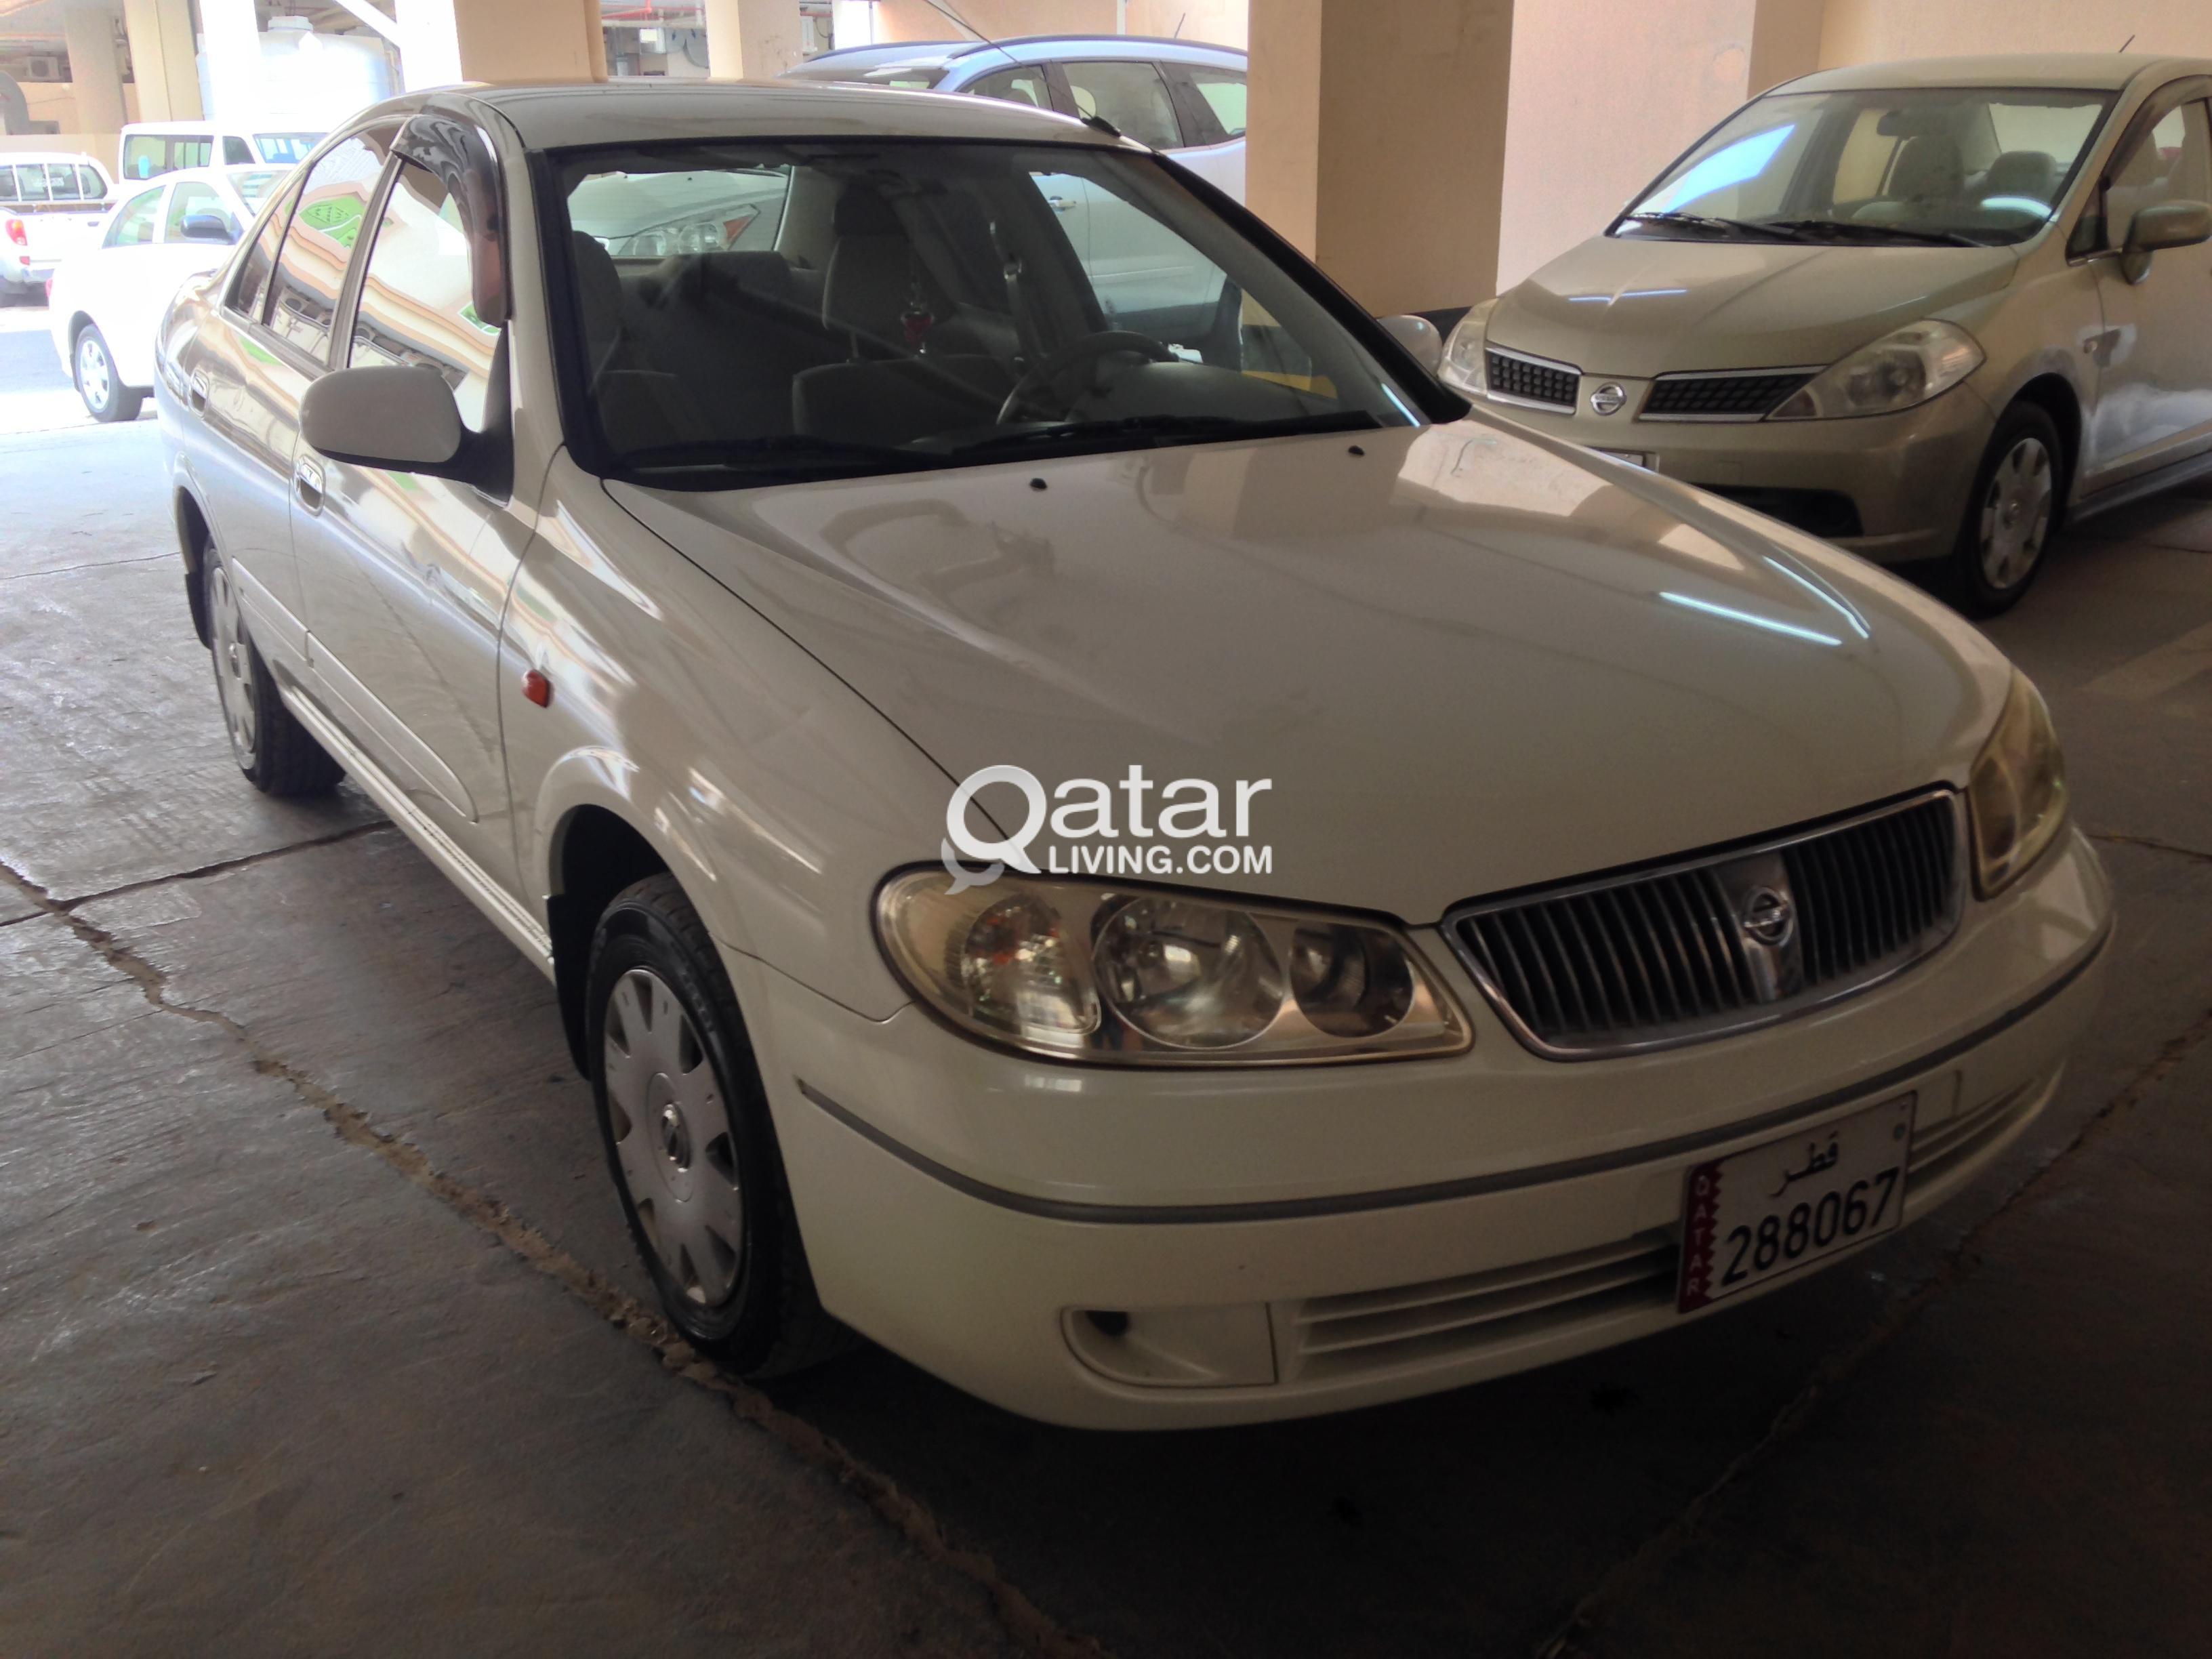 Nissan Sunny Ex Salon 1 8 Japan Made For Sale Qatar Living